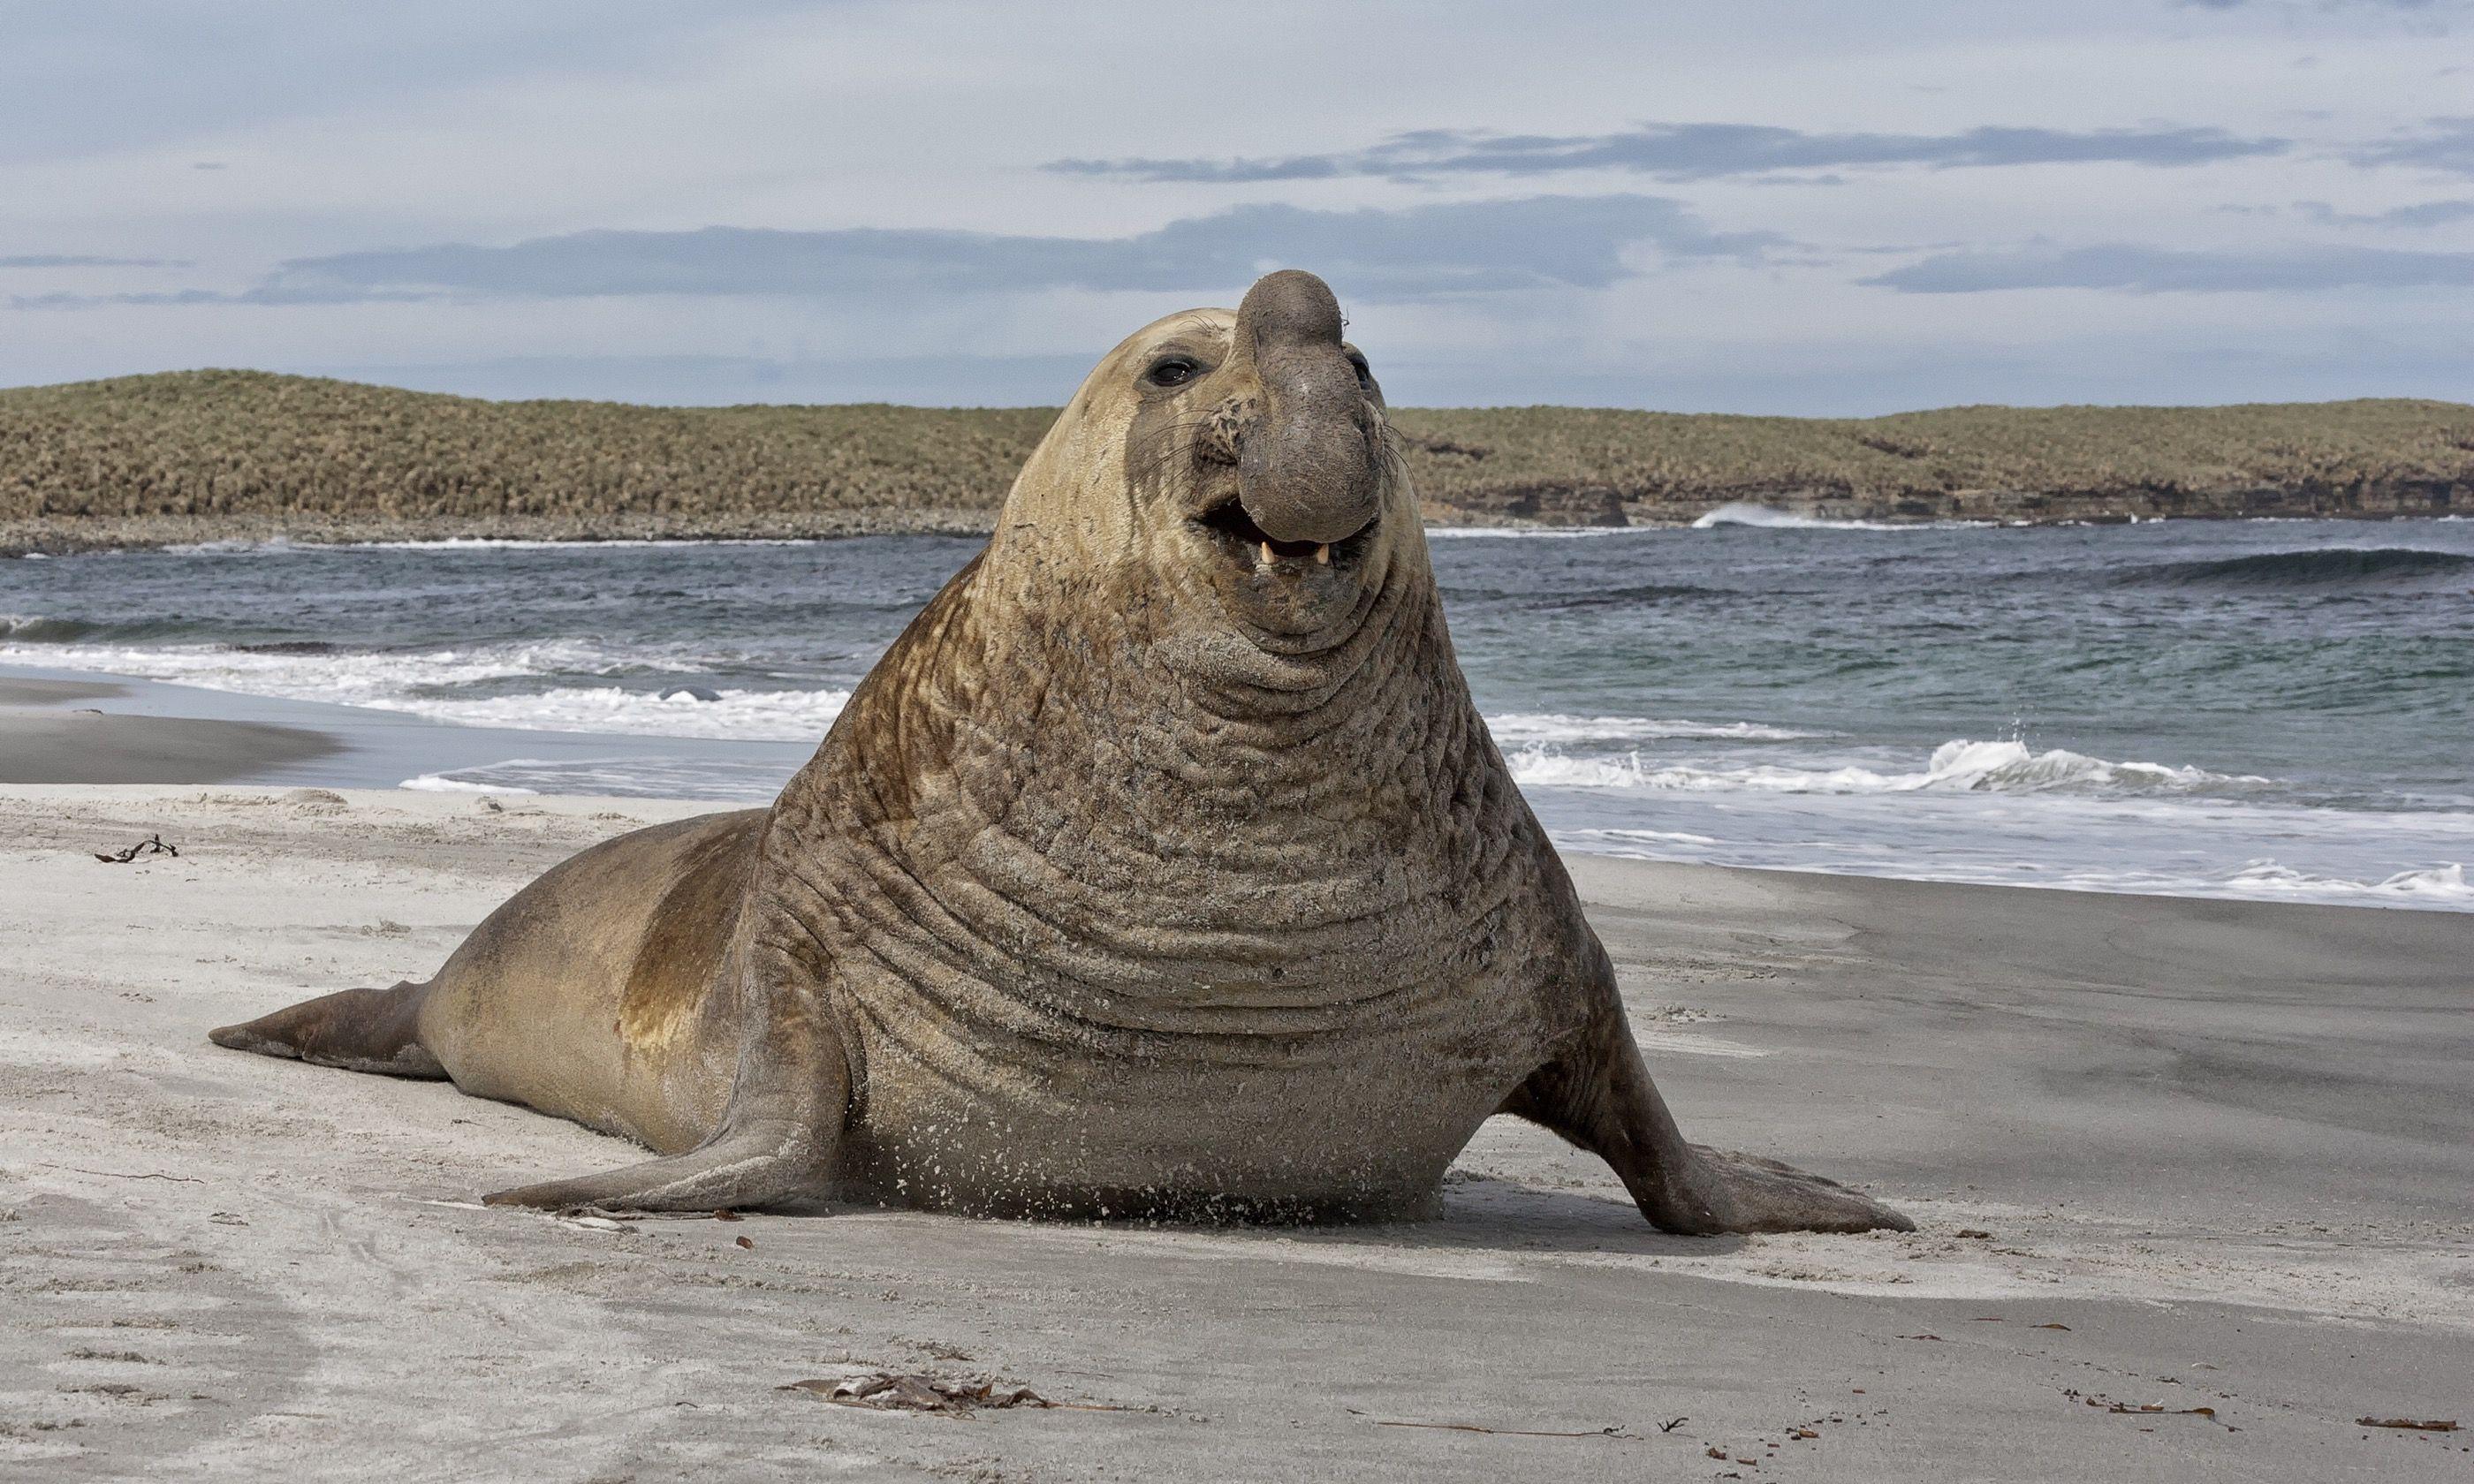 Southern elephant seal (Shutterstock.com)